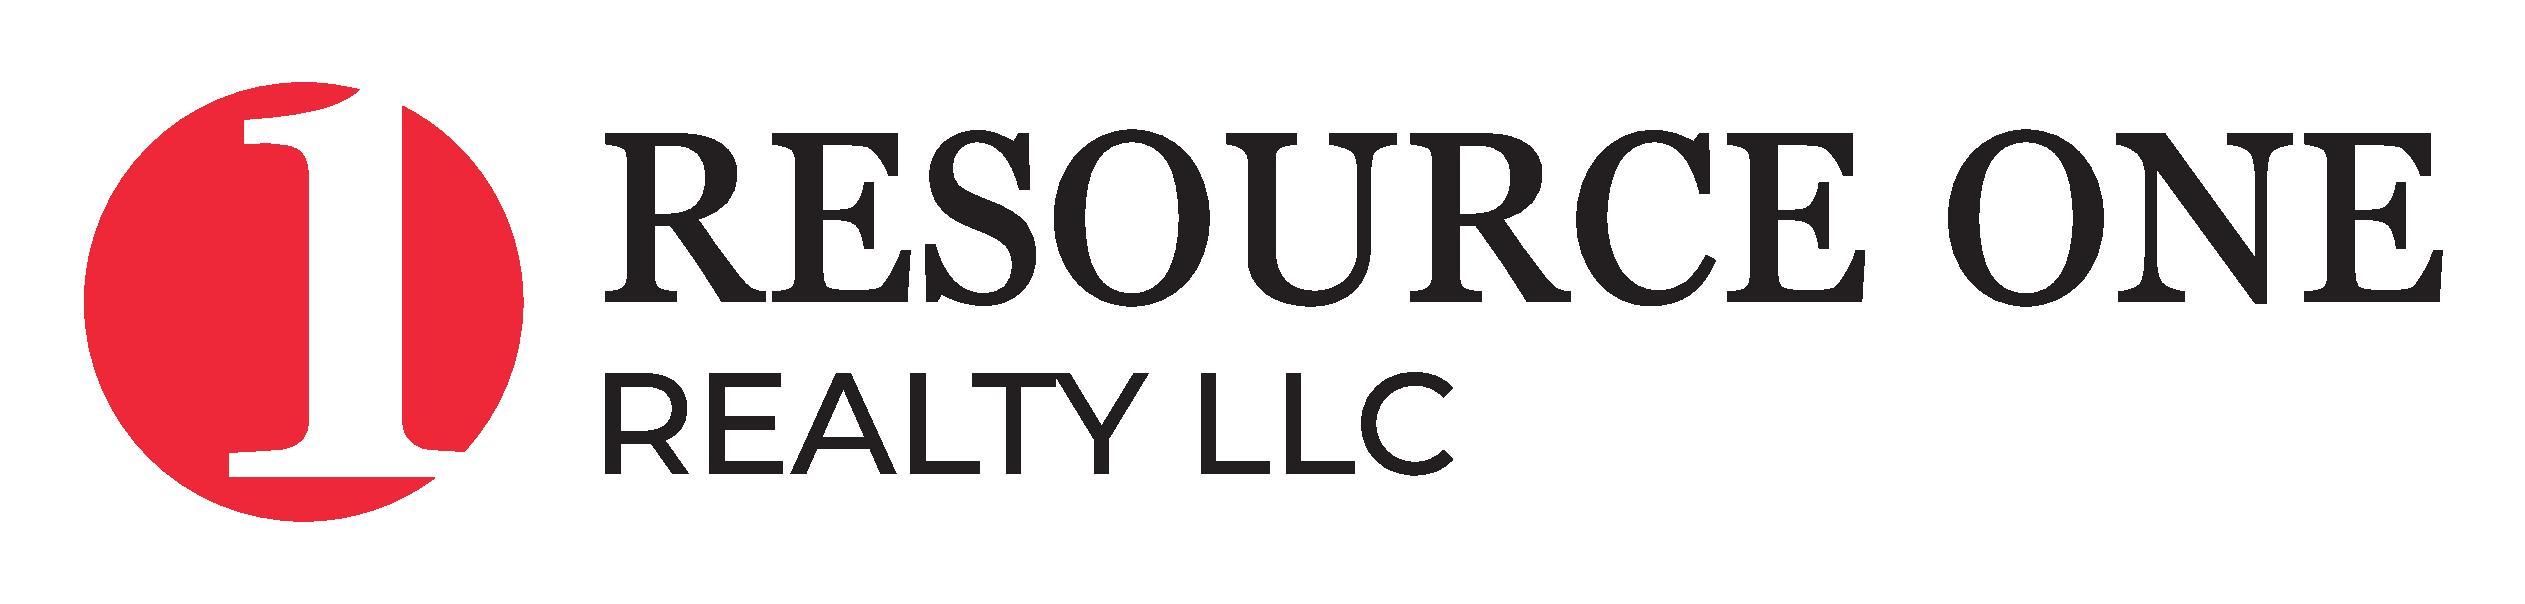 Hole/Tee Sponsors - Resource One Realty LLC - Logo